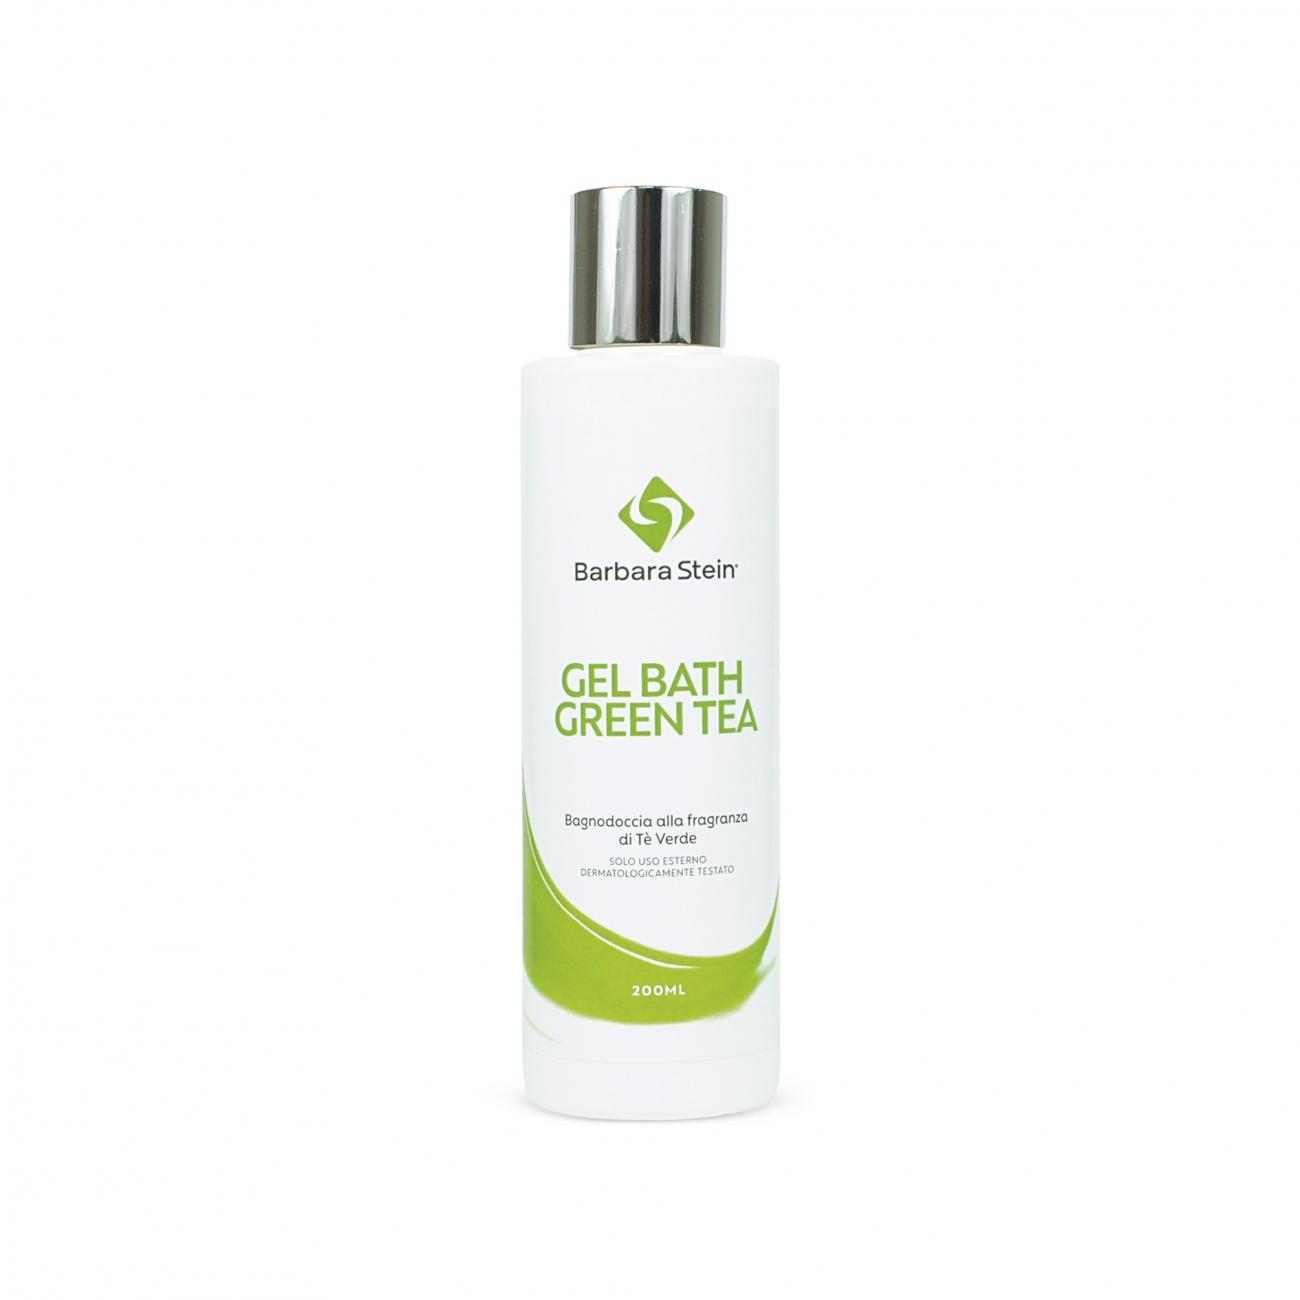 GEL BATH GREEN TEA (200 ml)